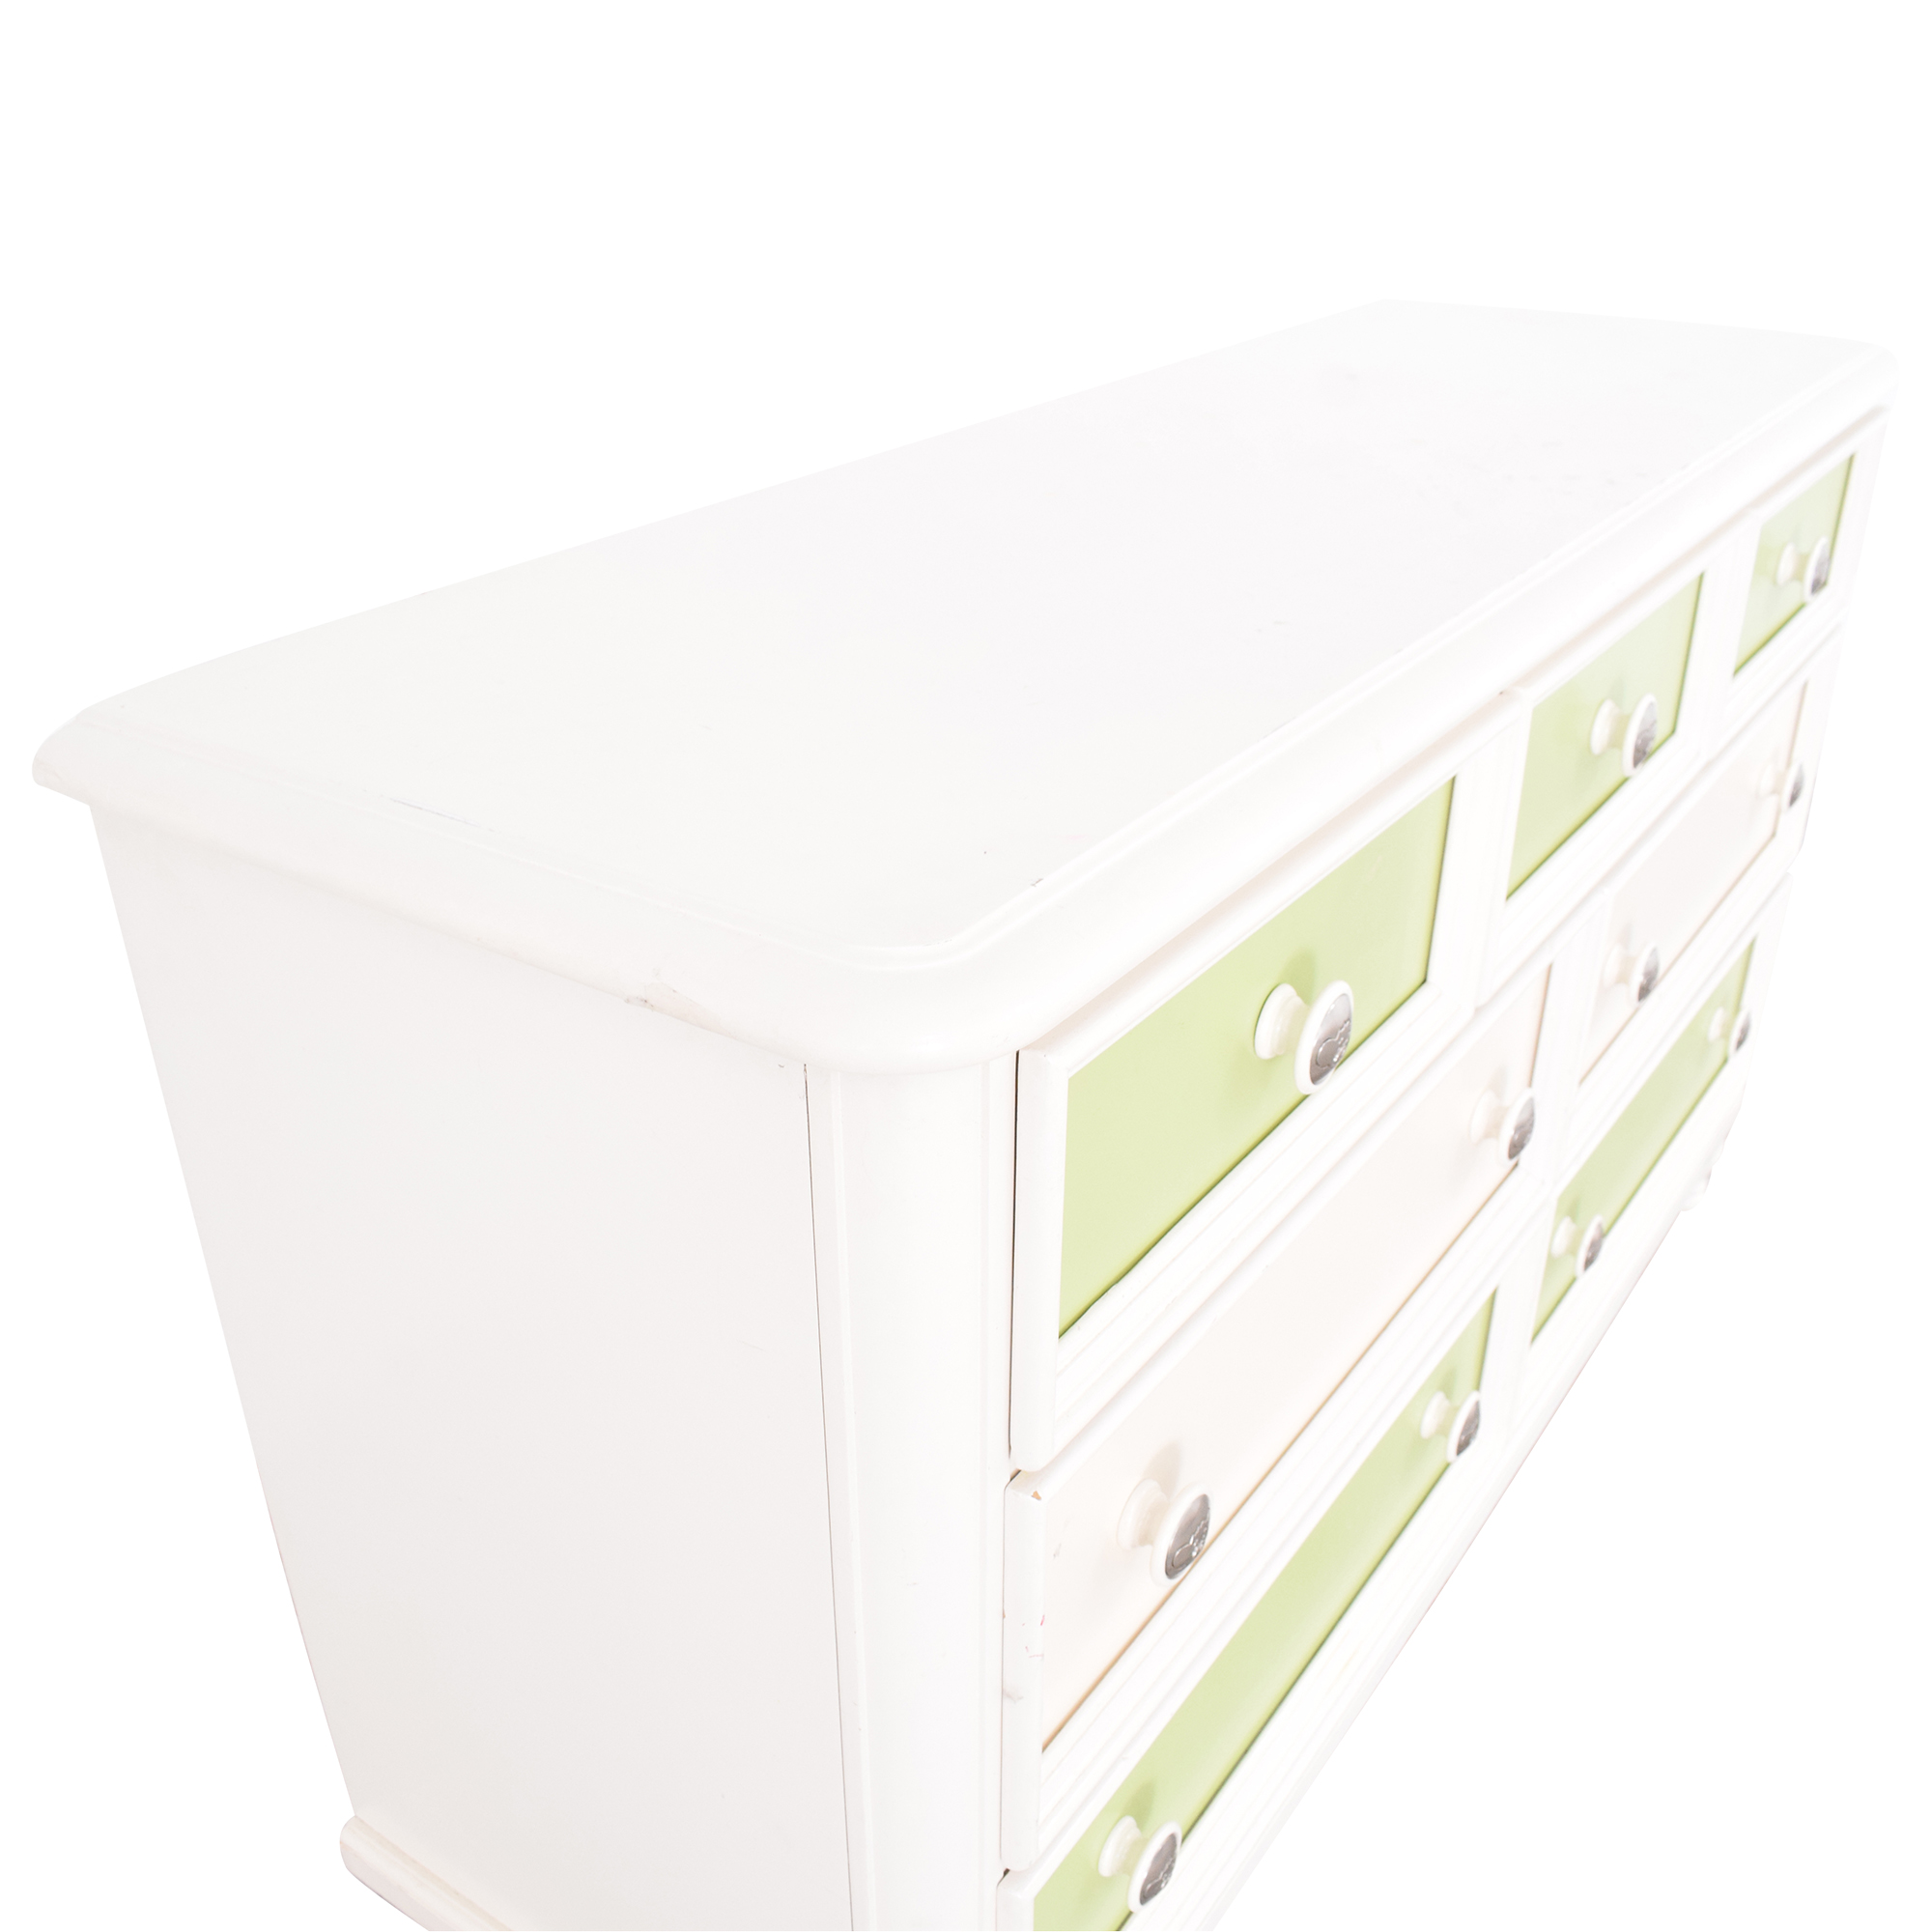 Raymour & Flanigan Colored Panel Dresser / Dressers